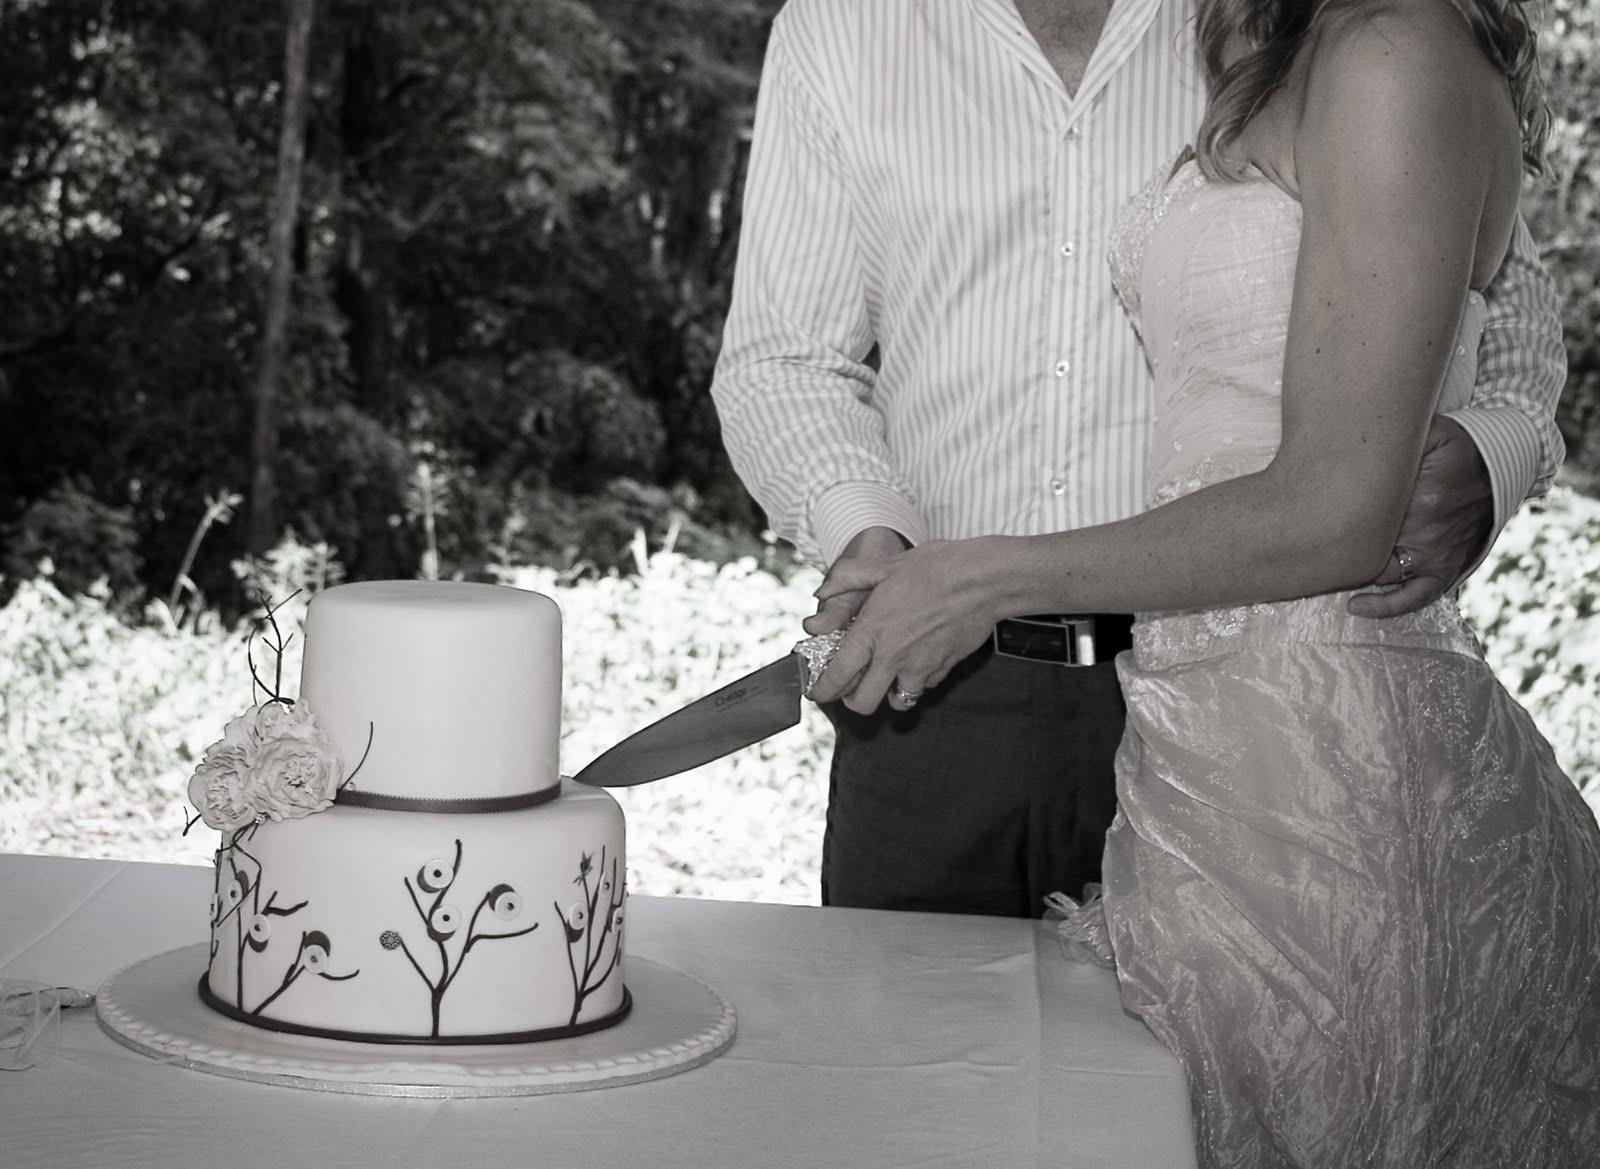 emelin s blog gambar frame wedding psd emelin s blog gambar frame wedding psd